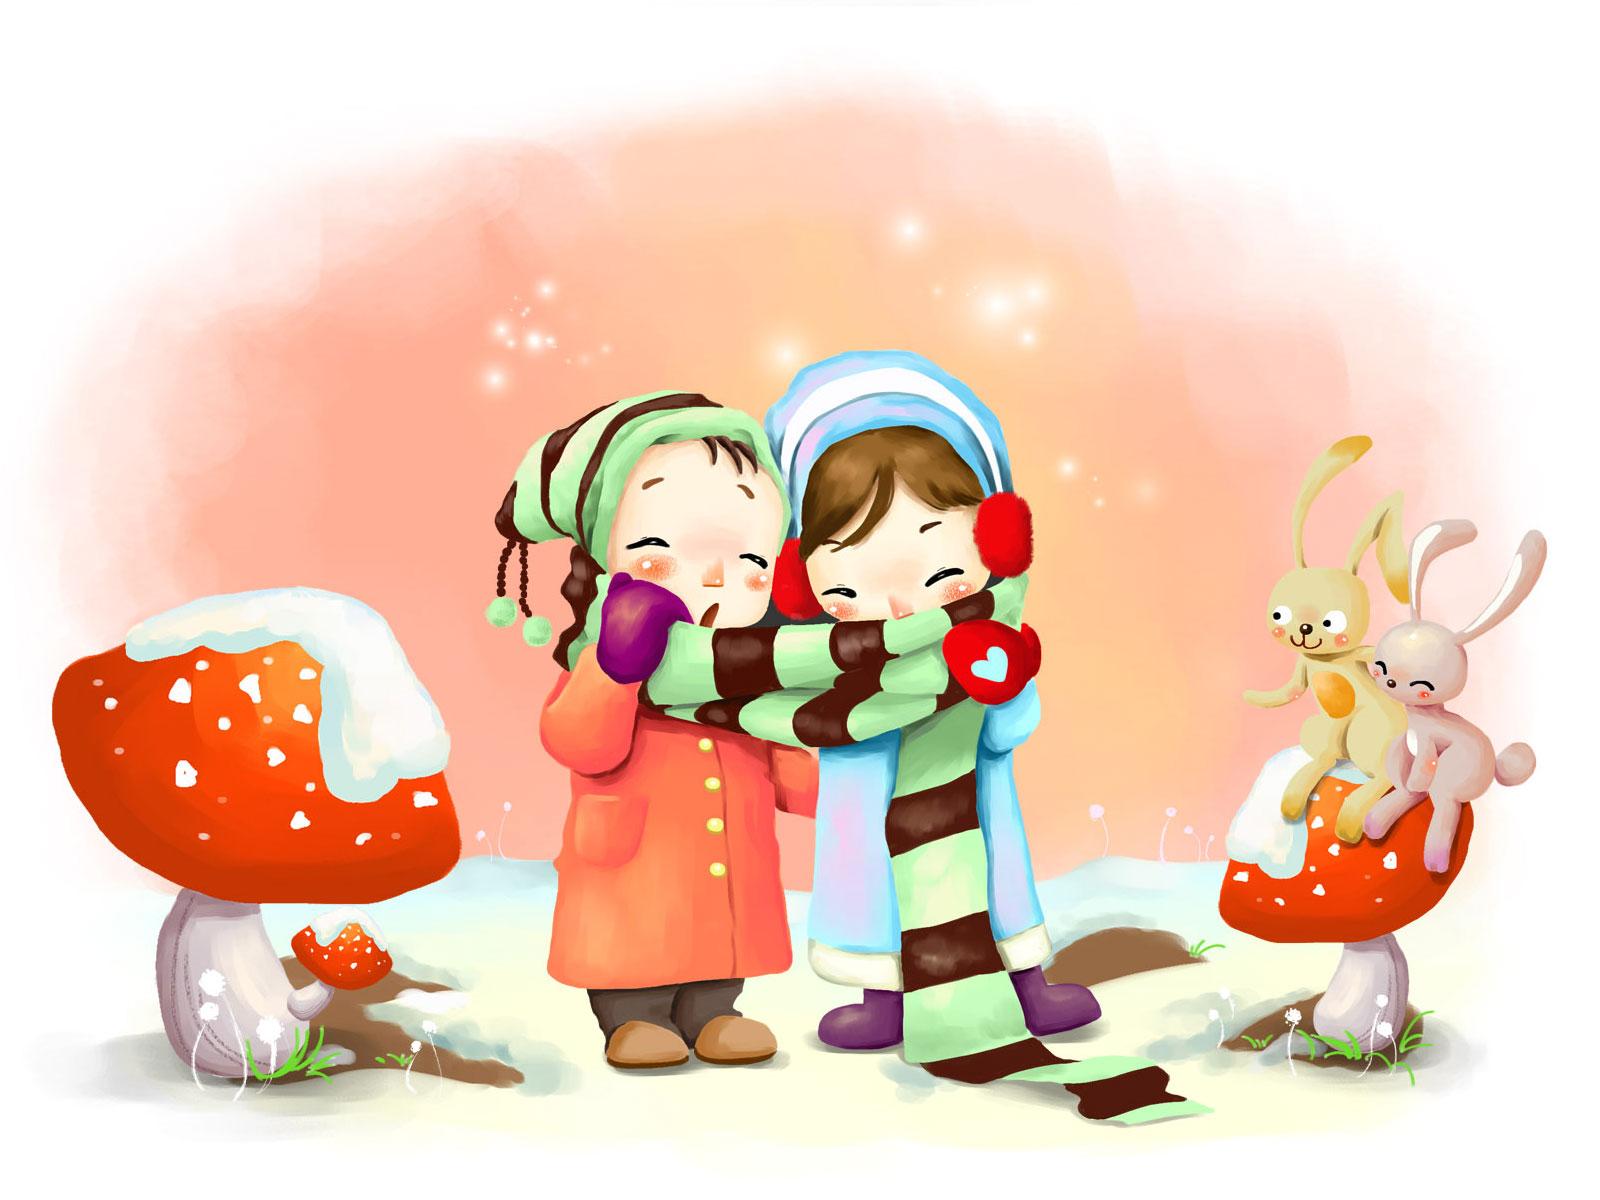 Cute Cartoon Animal Wallpapers Valentines cute cartoon 1600x1200